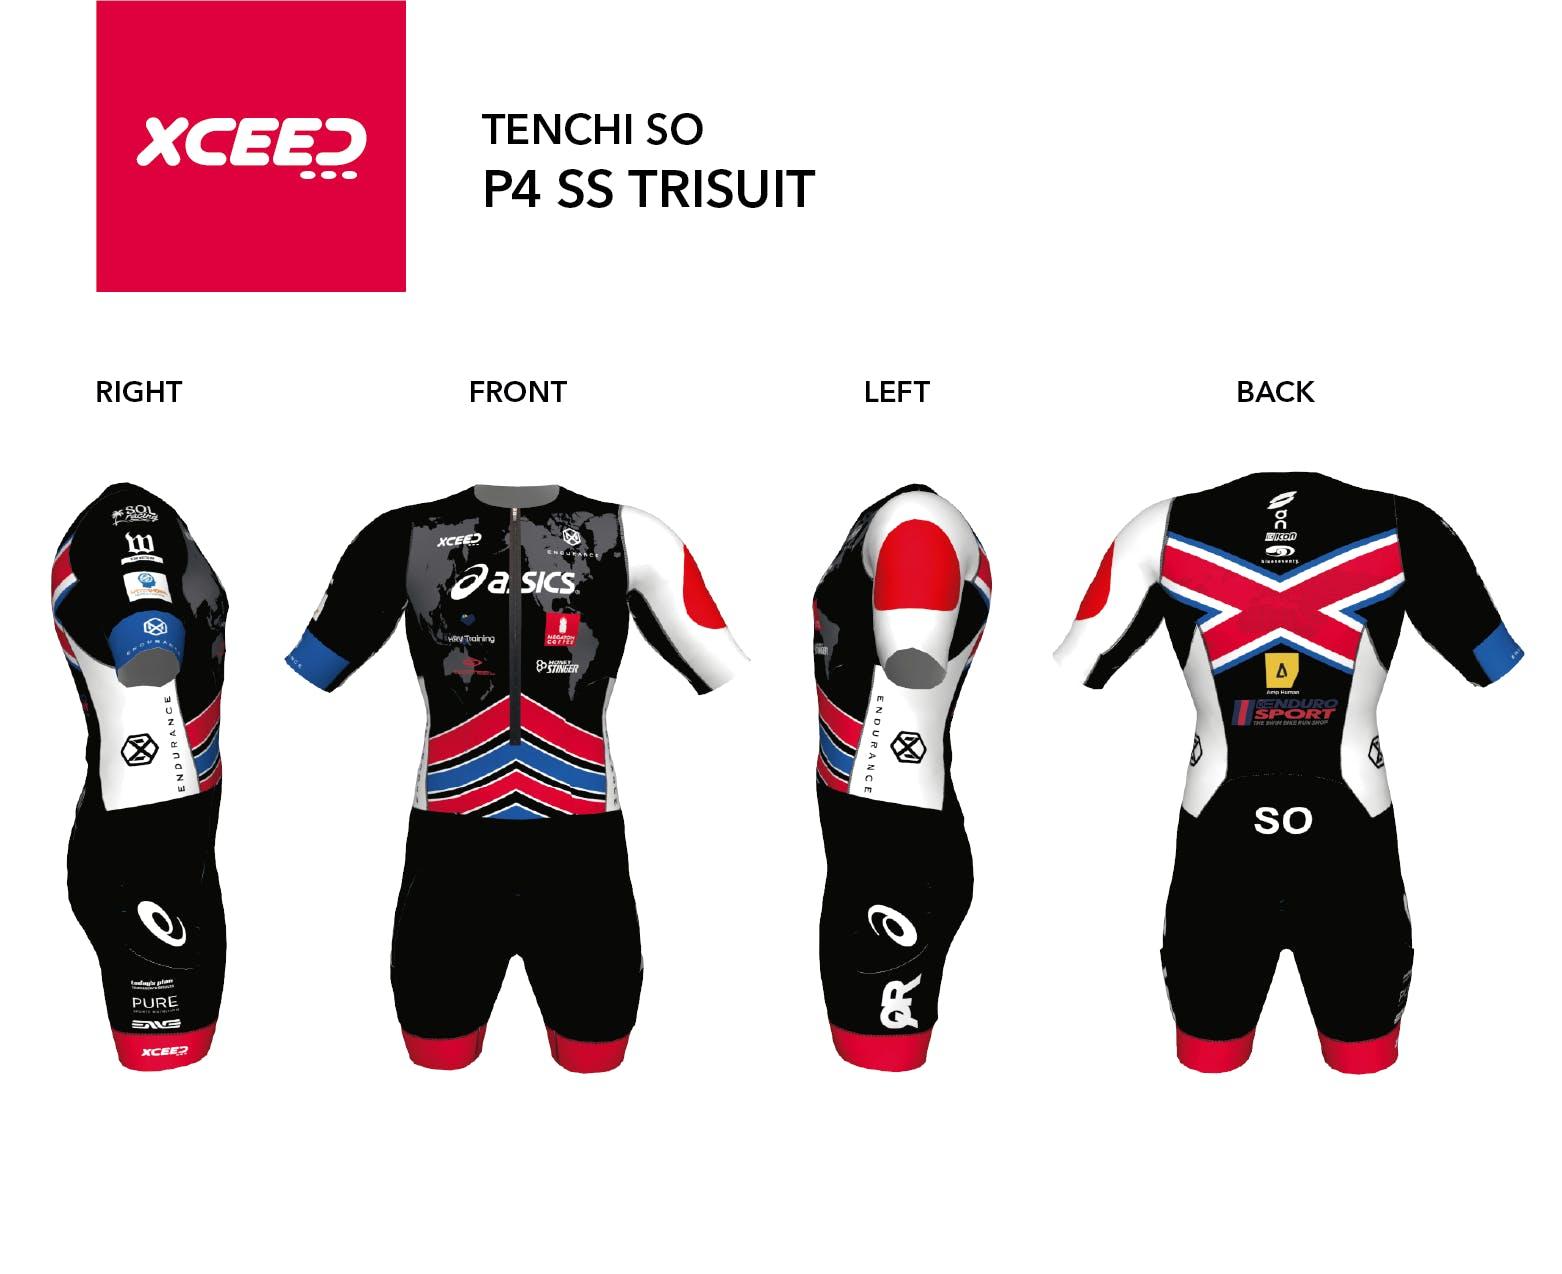 P4 Short Sleeve Tri Suit Tenchi So